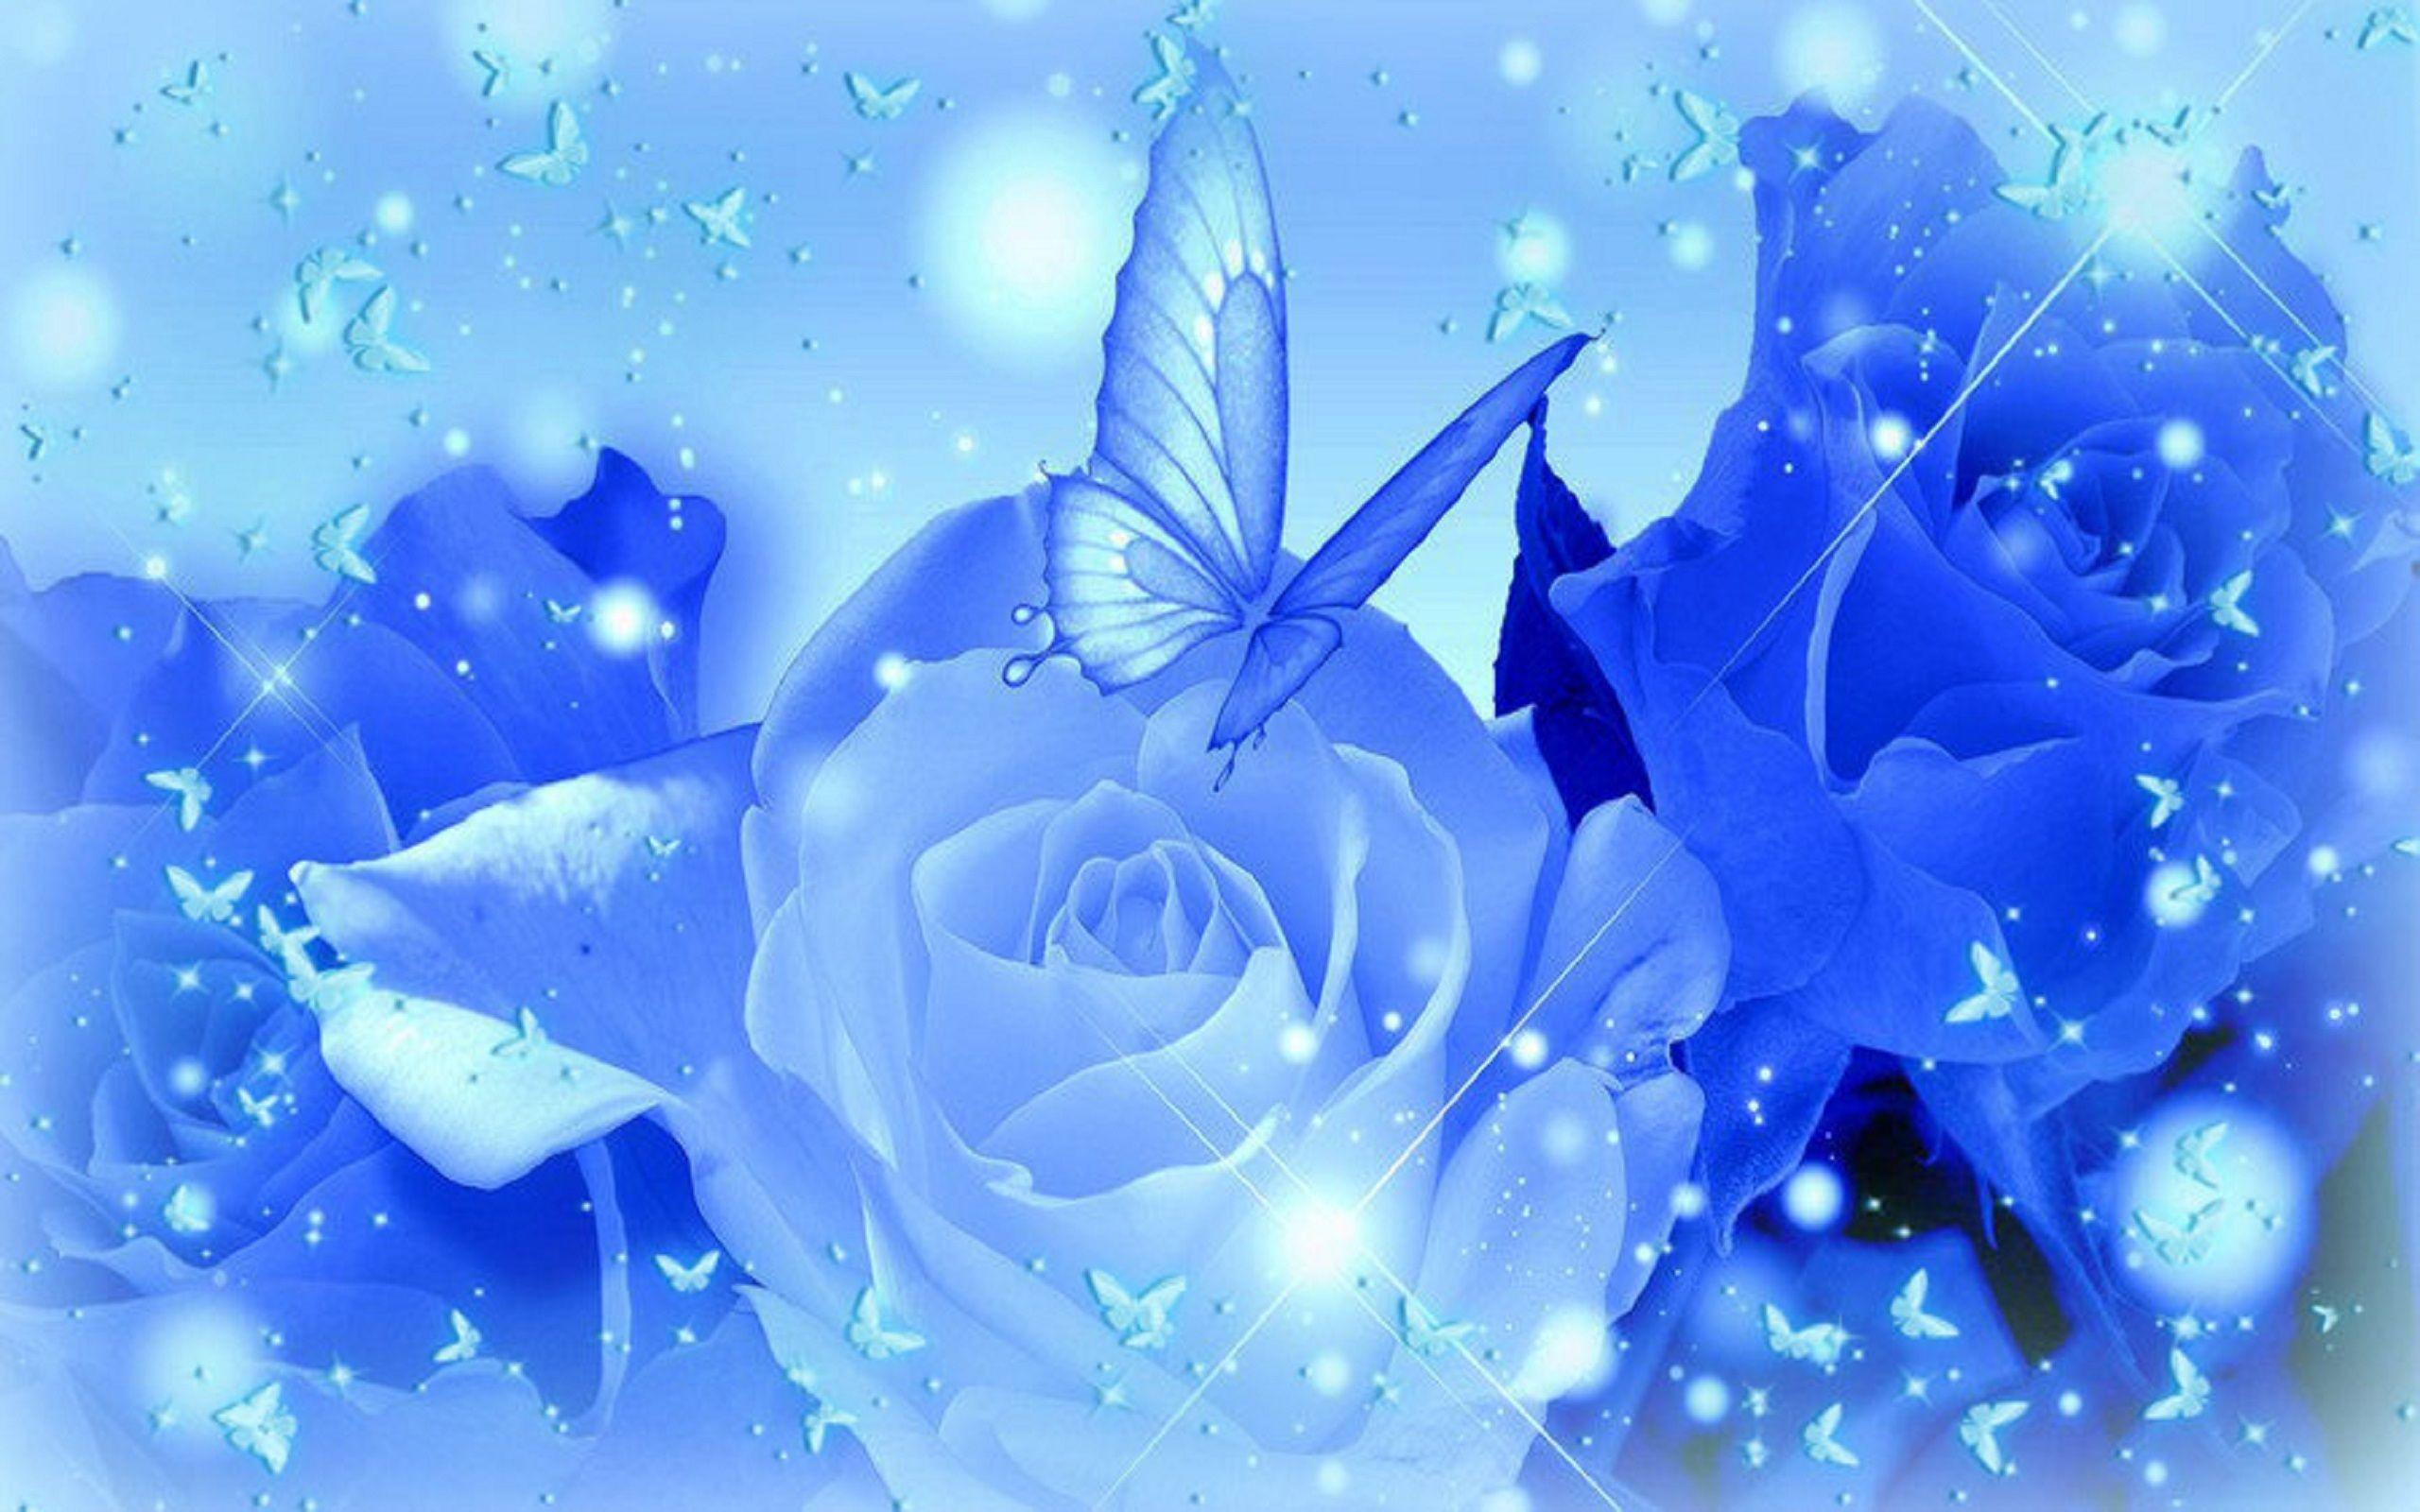 Blue Rose Desktop Wallpapers in 2020 | Blue roses ...